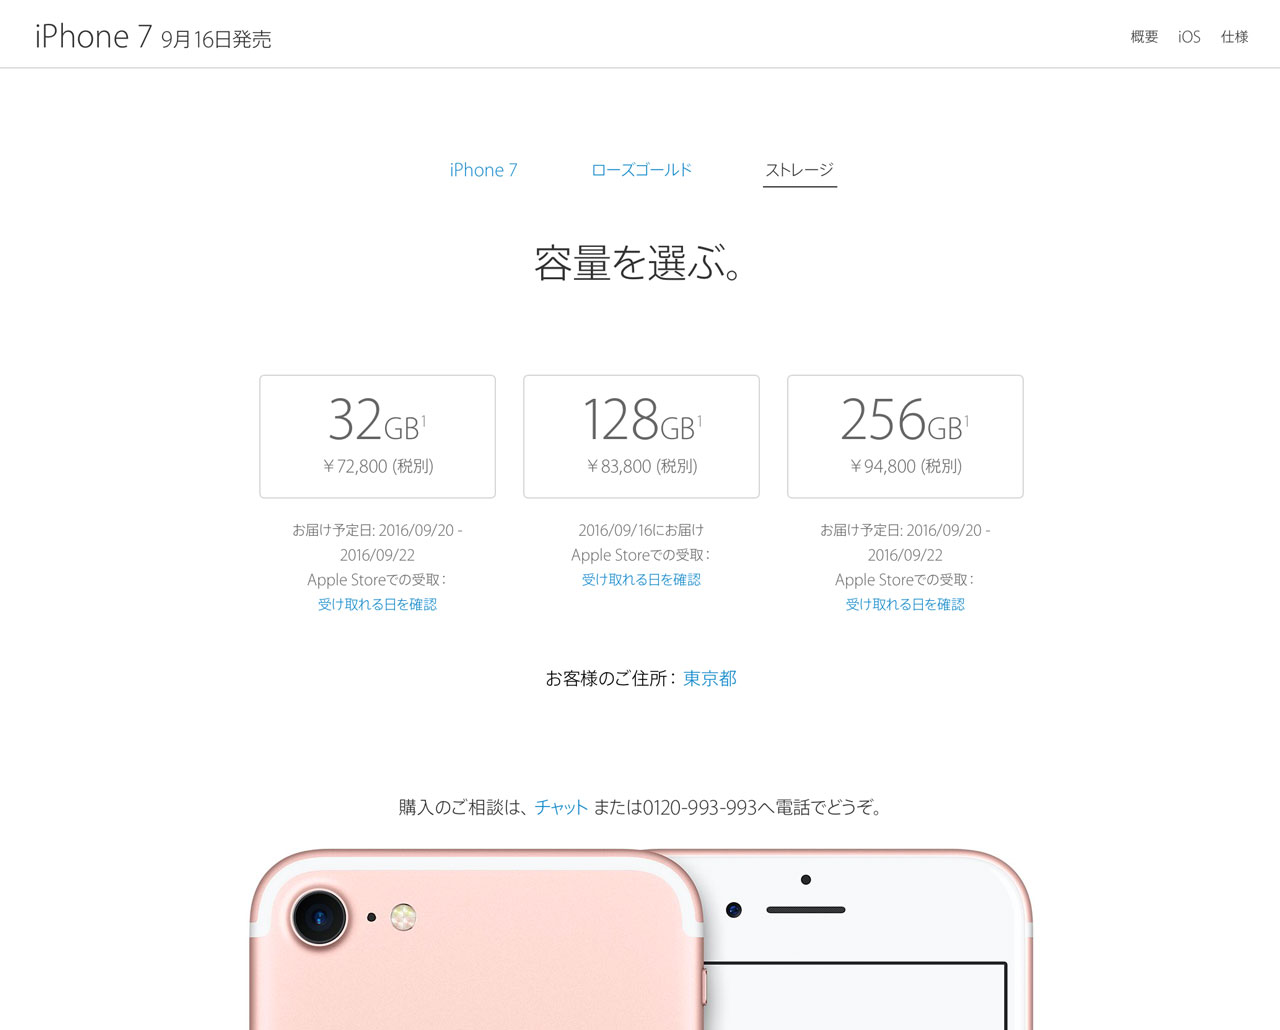 iphone-7-apple-store-japan-7